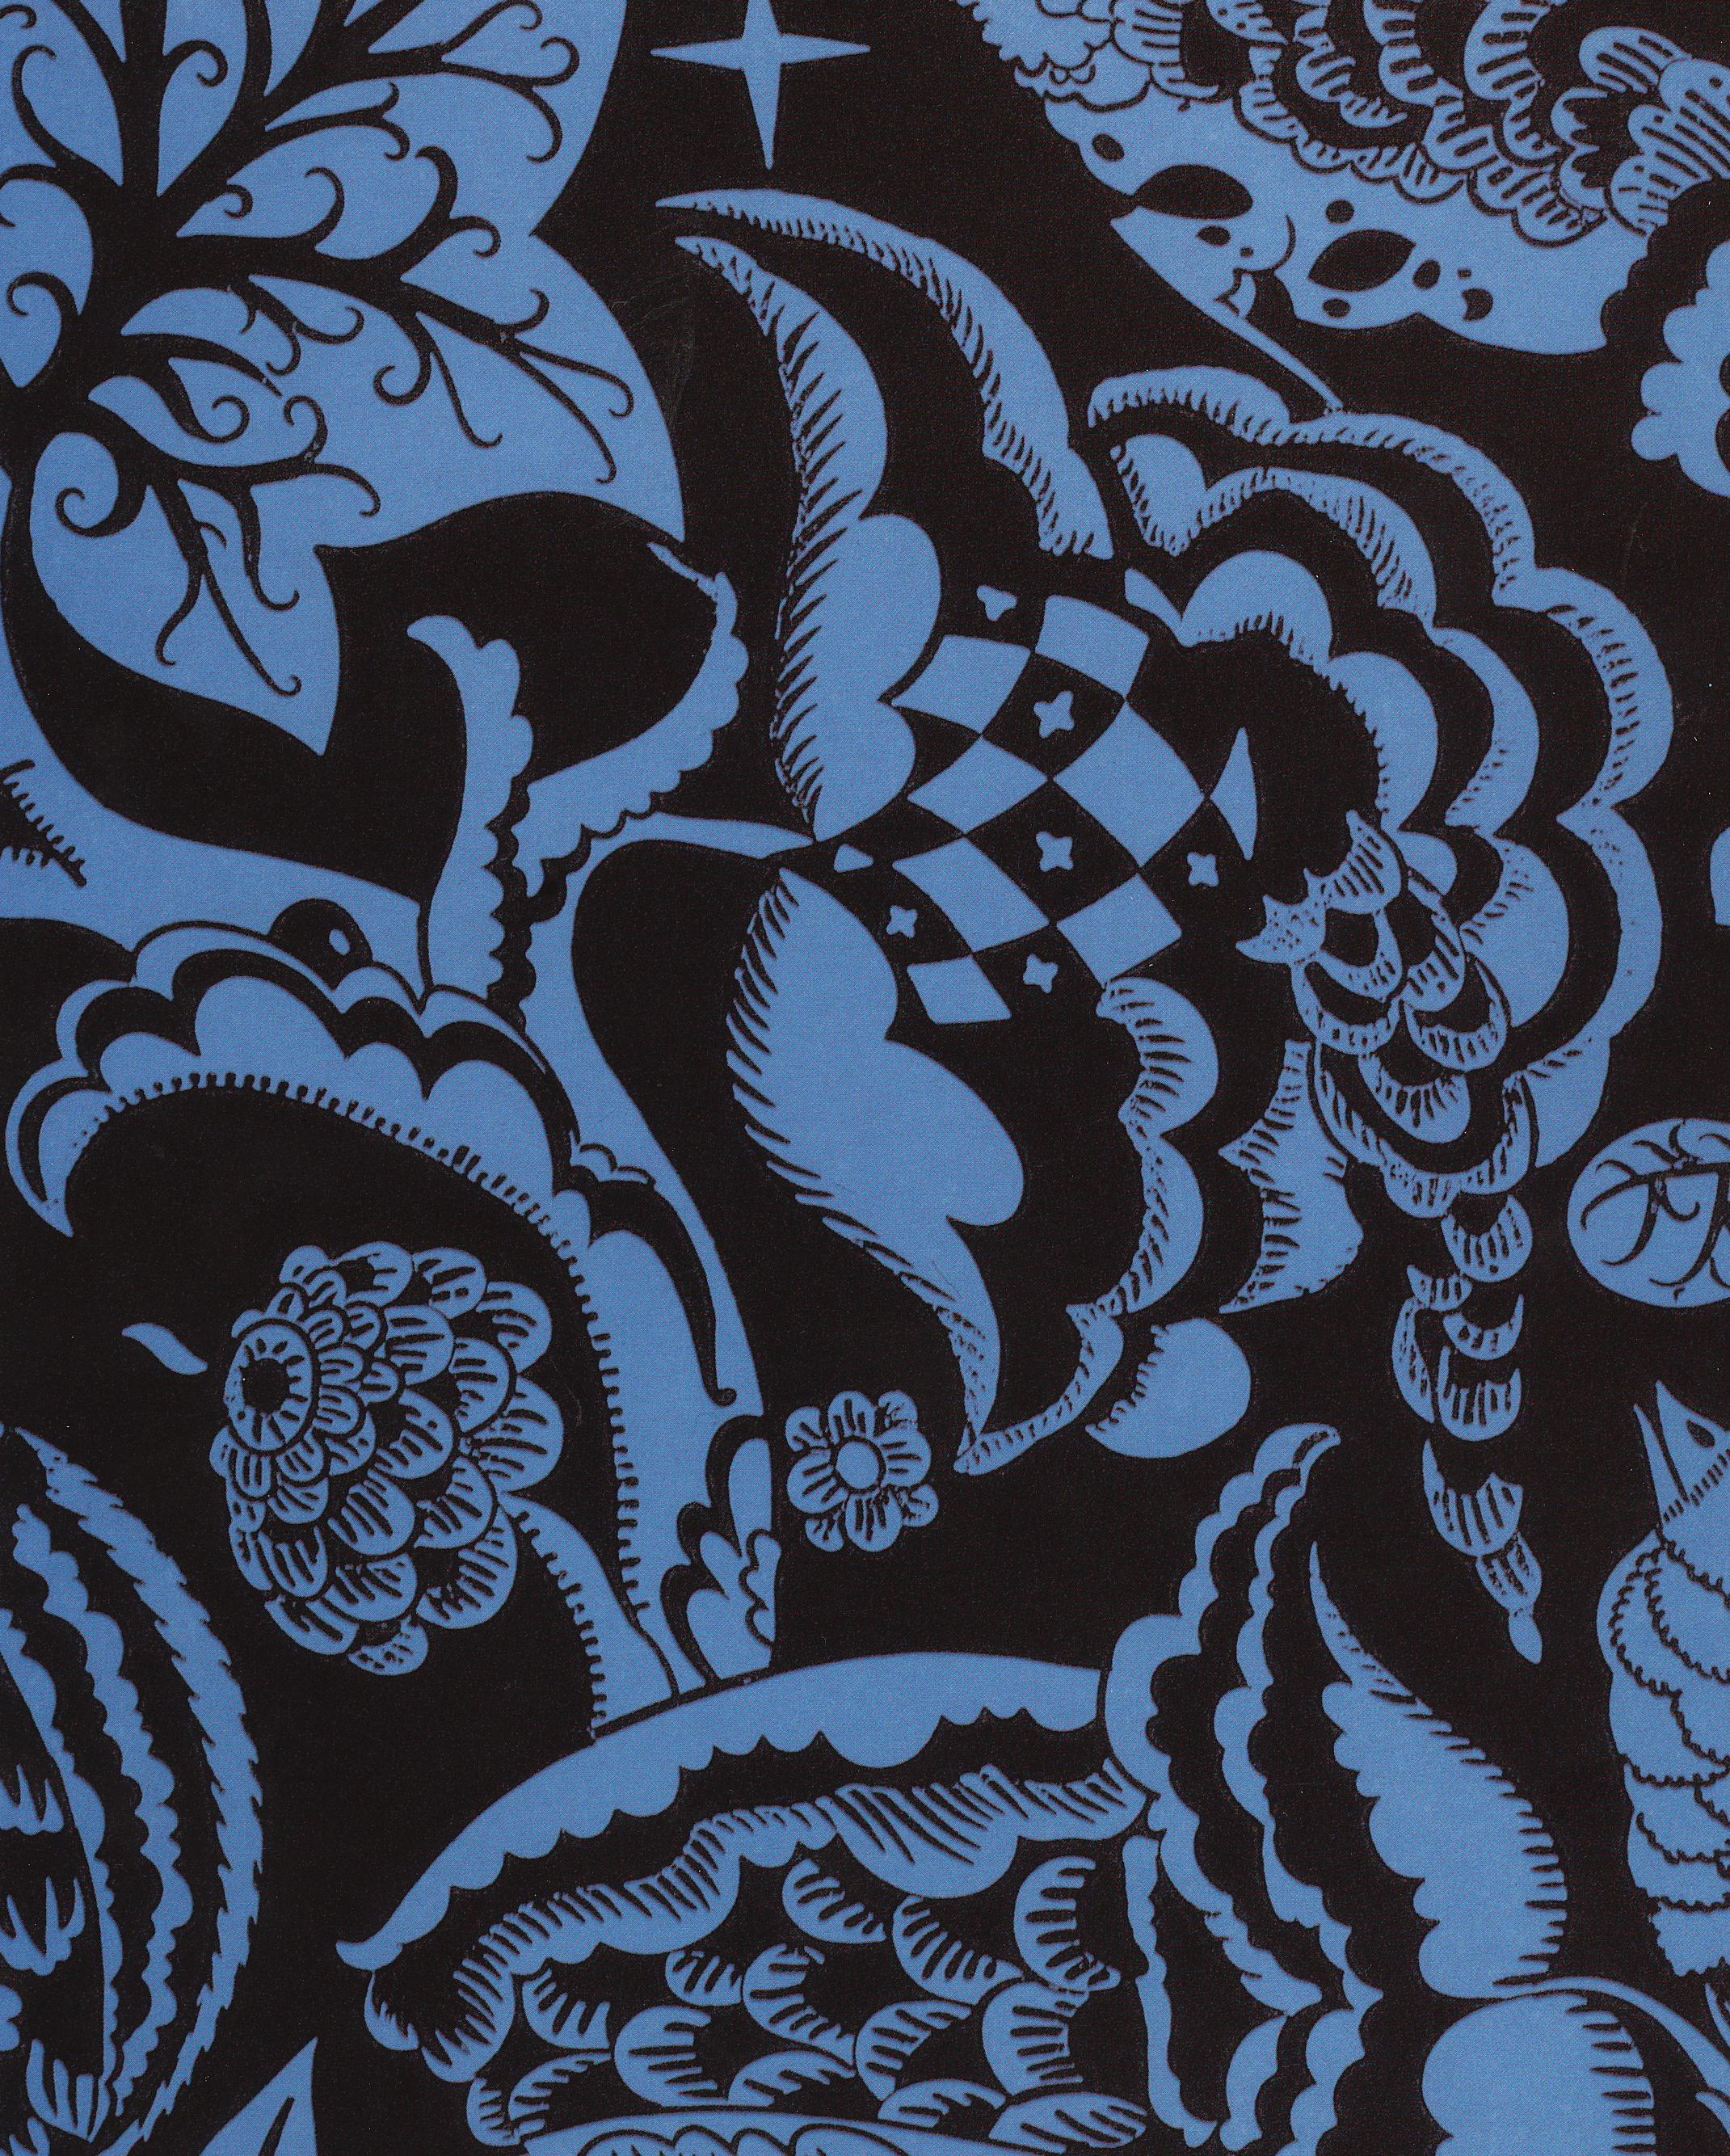 ... Peche, Genius of Ornament » Dagobert Peche—Wallpaper design